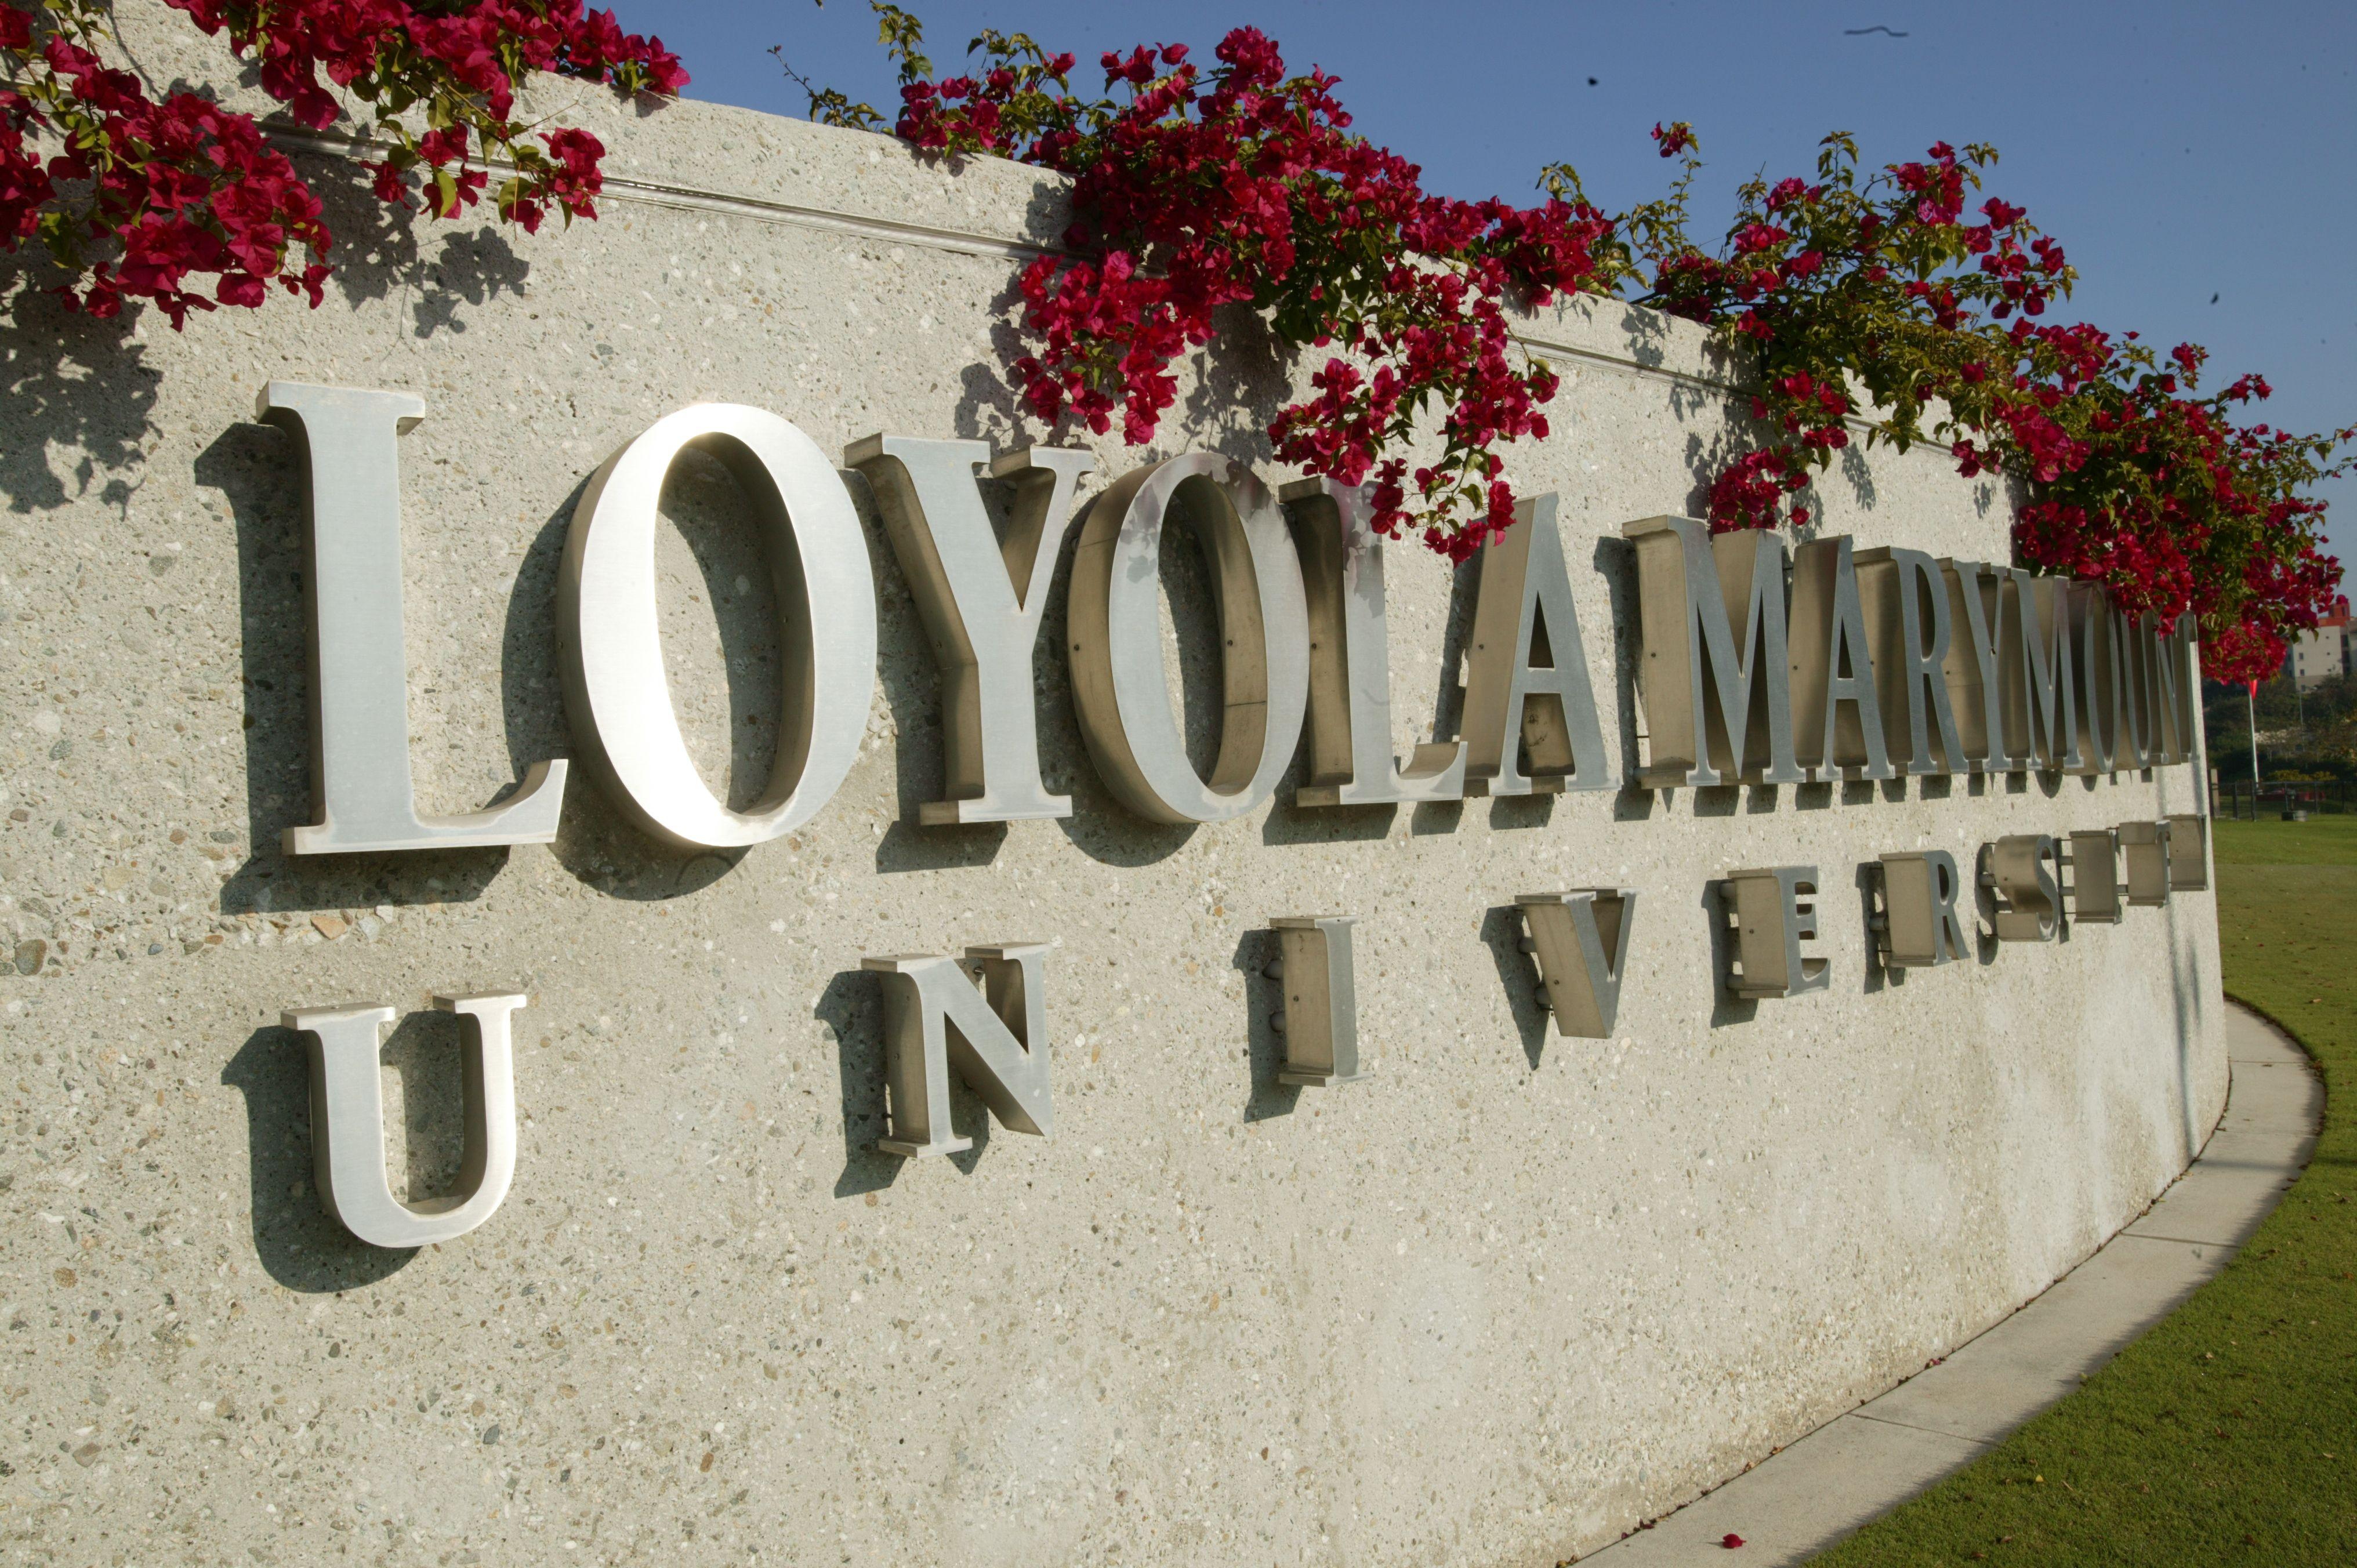 Pin By Karya International On Amerika Da Bulunan Universiteler Loyola Marymount University Catholic College Survival Lmu Essay Prompt